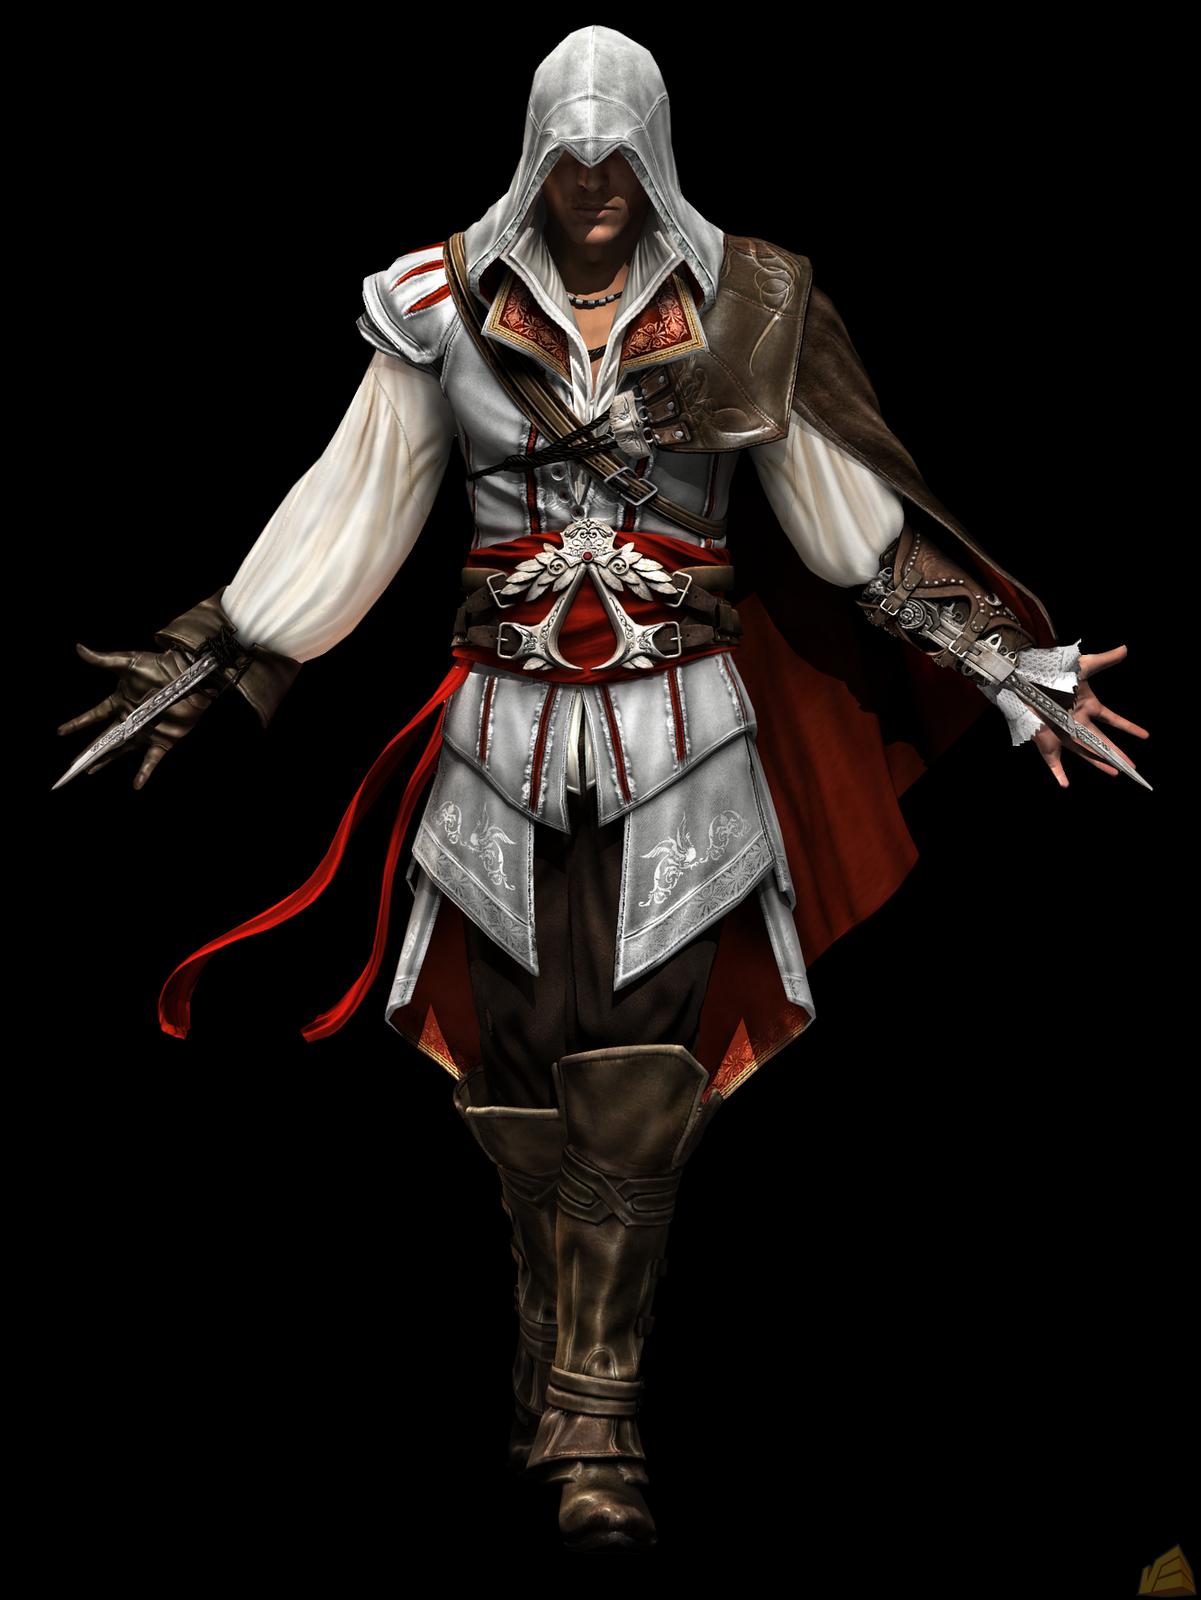 Watch How to Train Like Ezio Auditore Da Firenze video